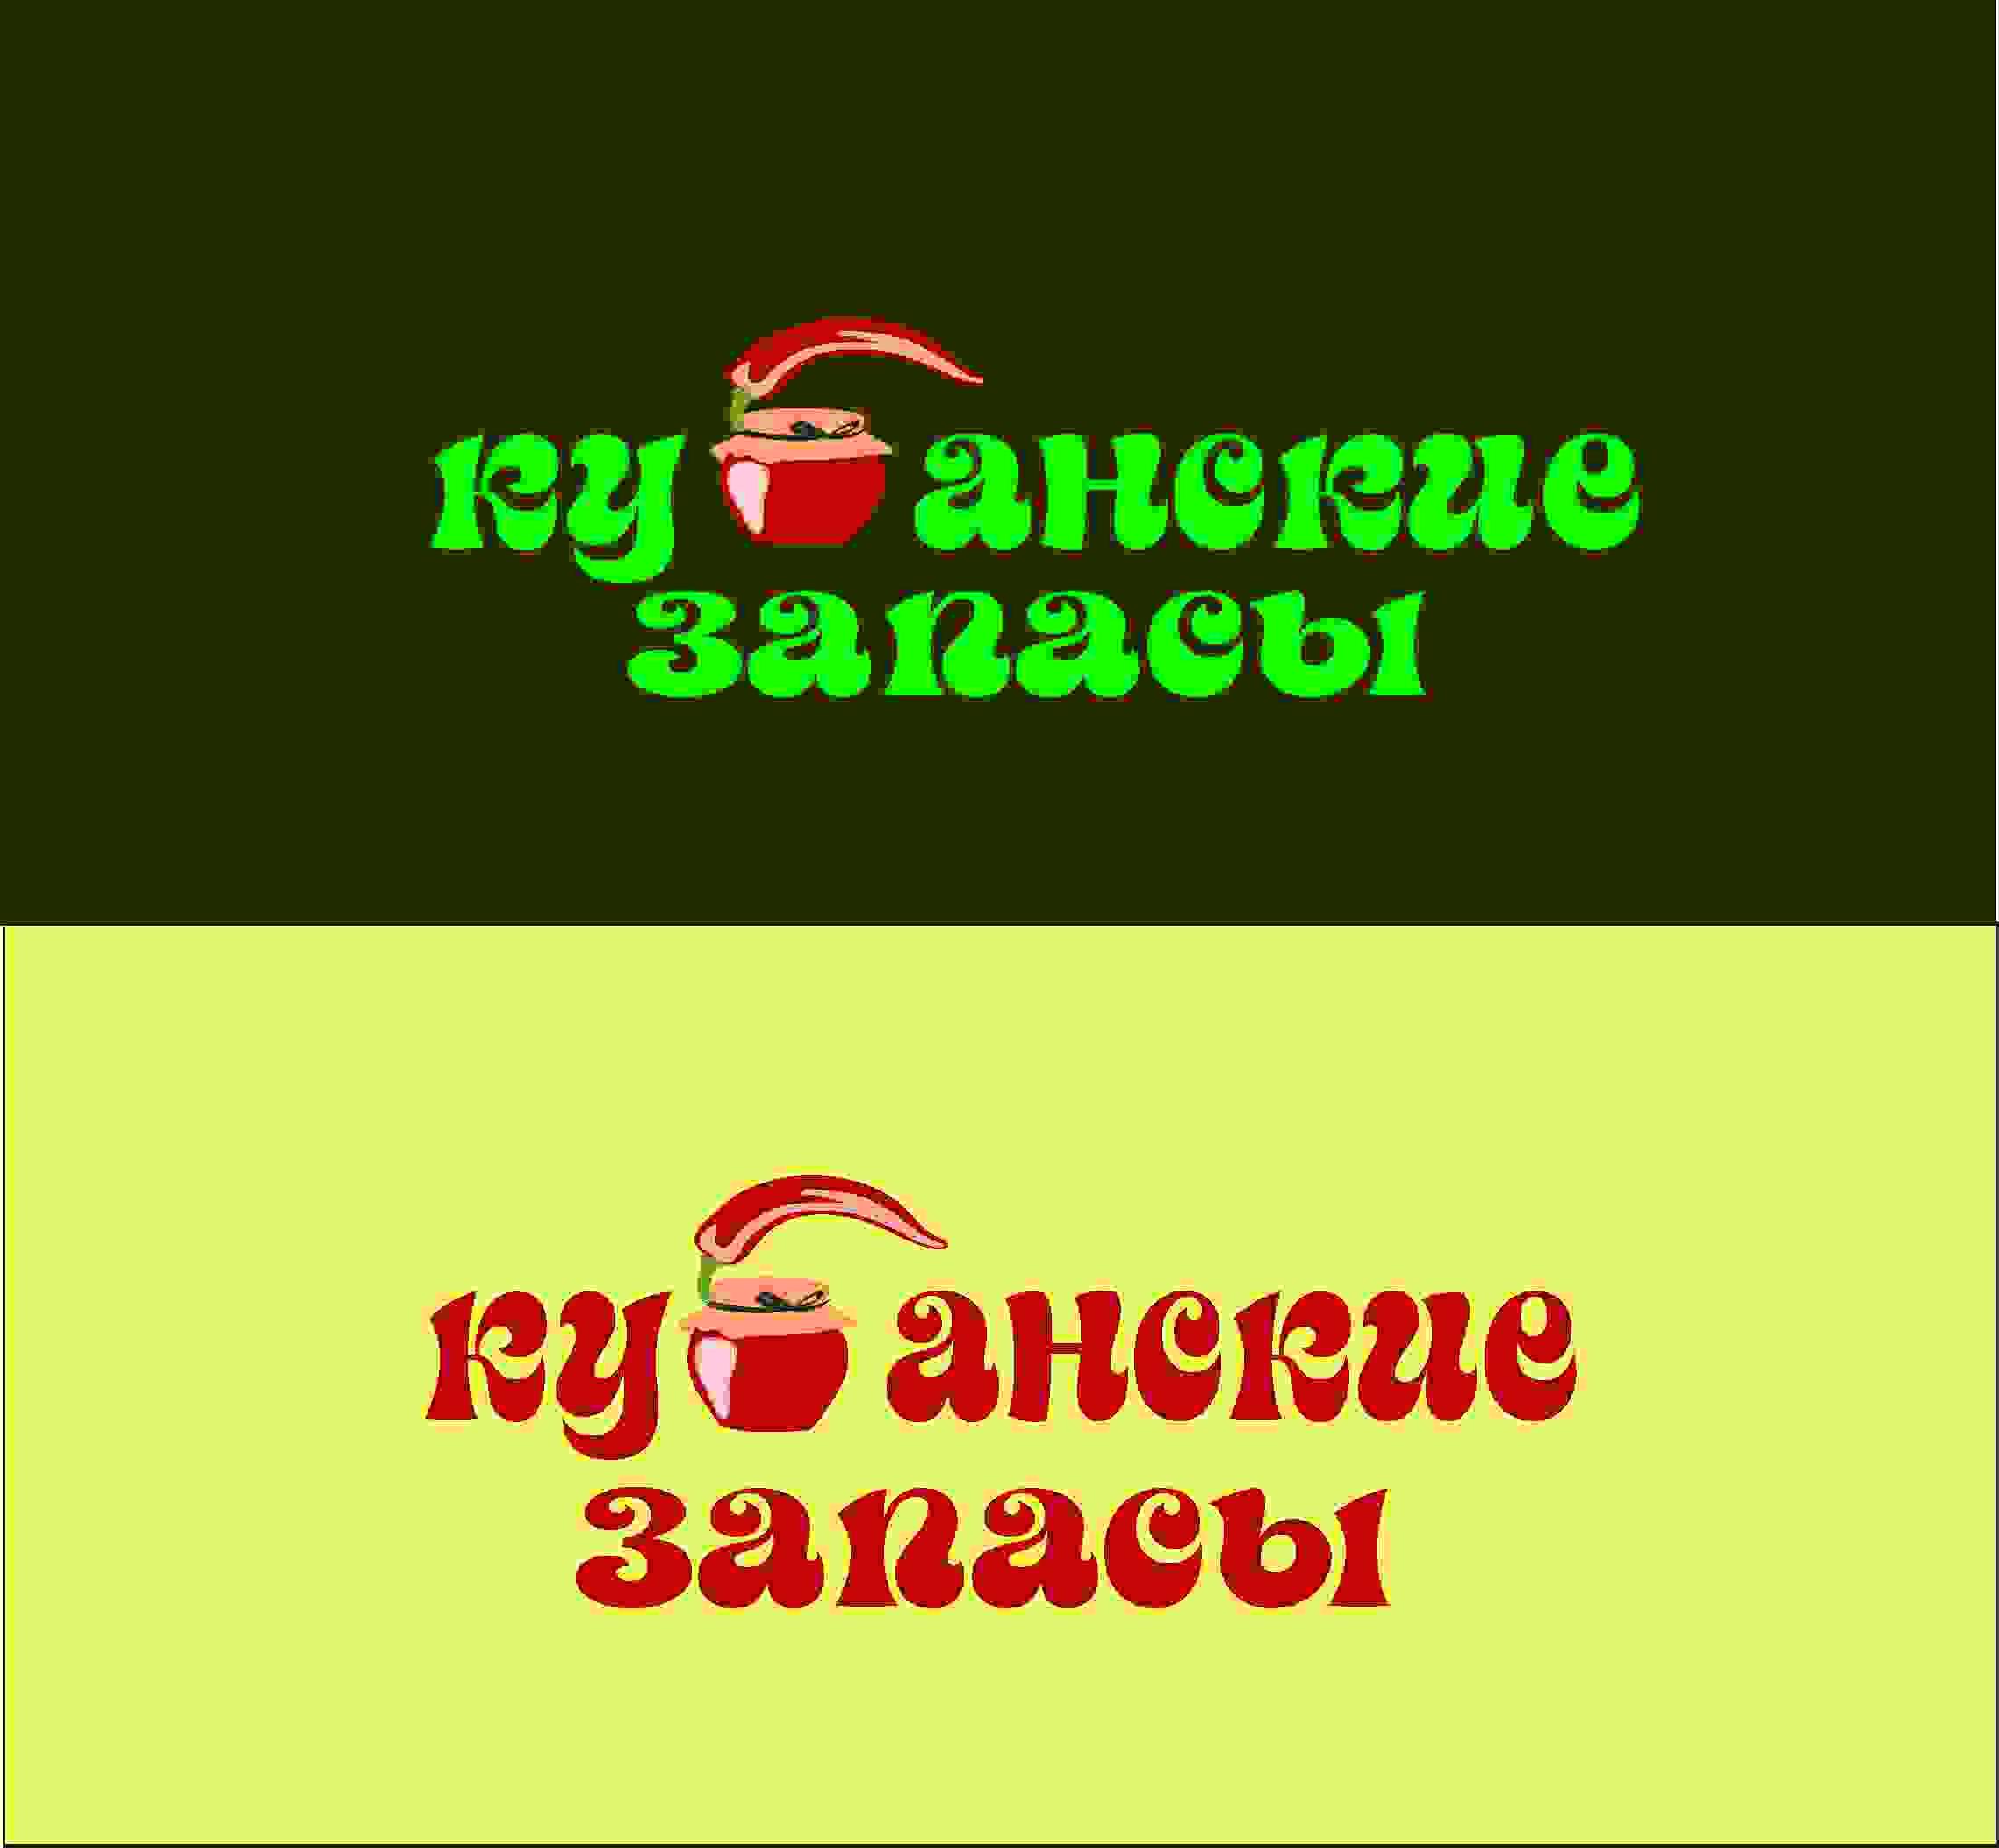 Логотип, фирменный стиль фото f_6445de665c71bb5d.jpg